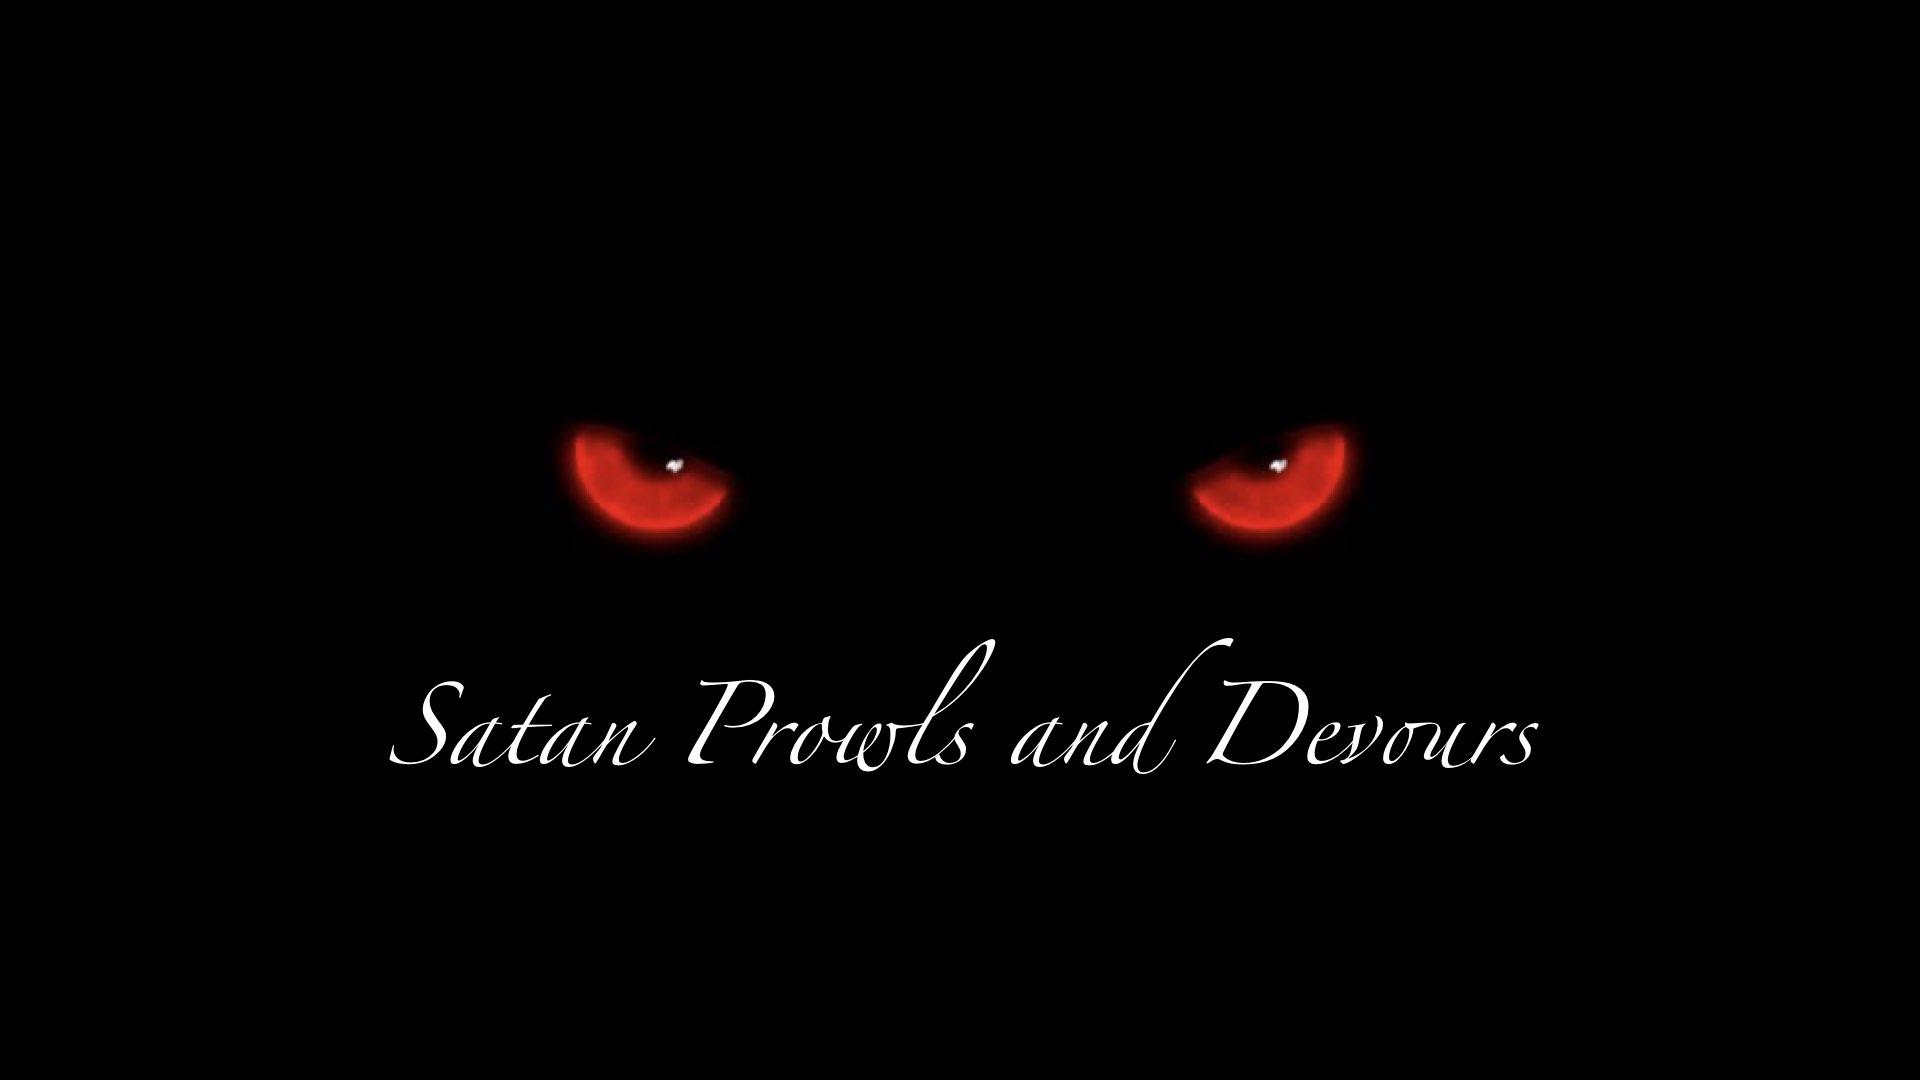 Satan Prowls and Devours